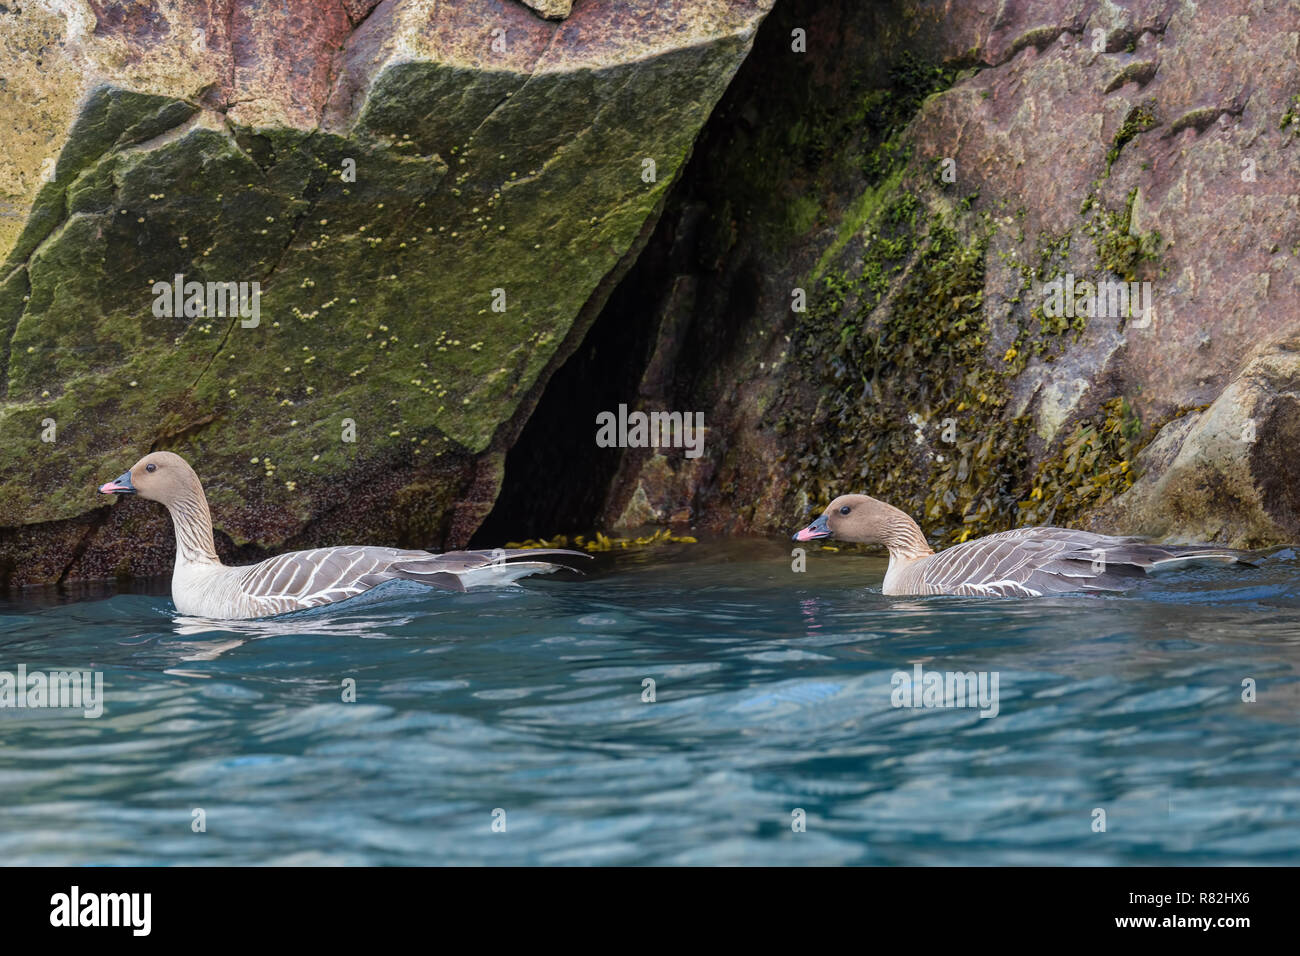 Pink-footed geese (Anser brachyrhynchus) swimming in the water, Monaco glacier, Liefdefjorden, Haakon VII Land, Spitsbergen Island, Svalbard Archipela Stock Photo